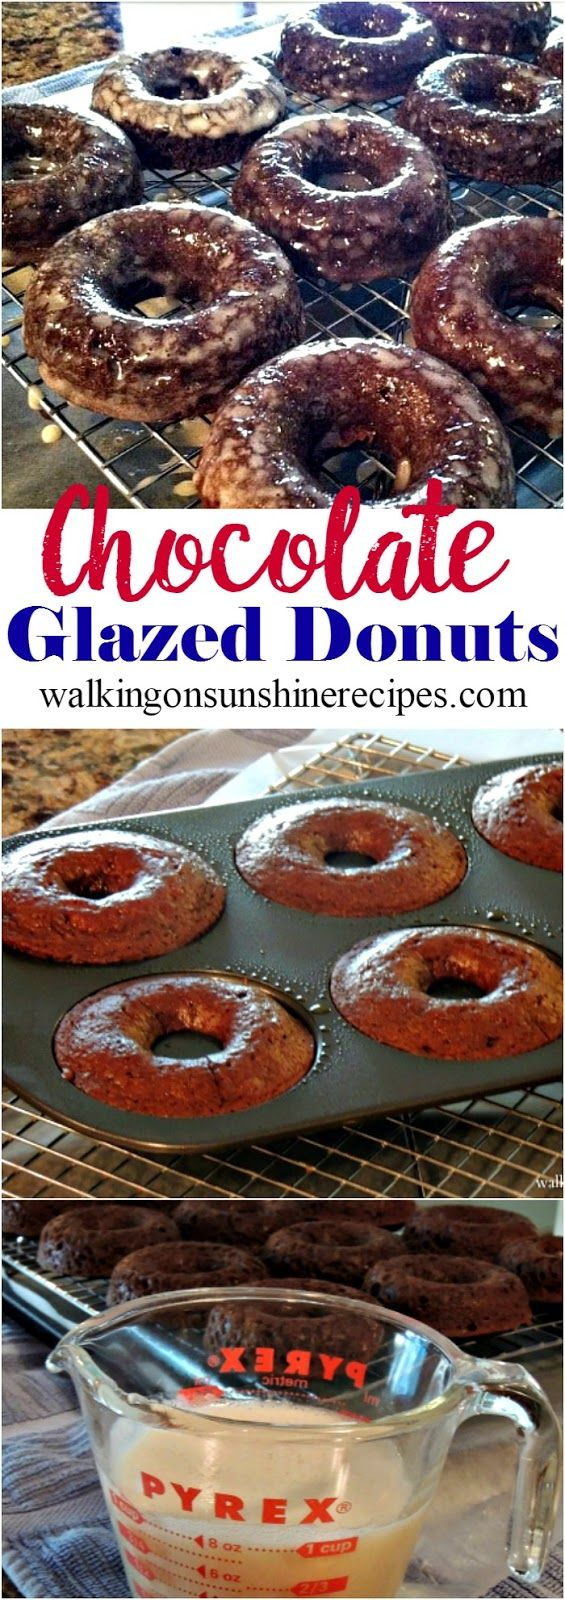 Chocolate Glazed Donuts from Walking on Sunshine Recipes